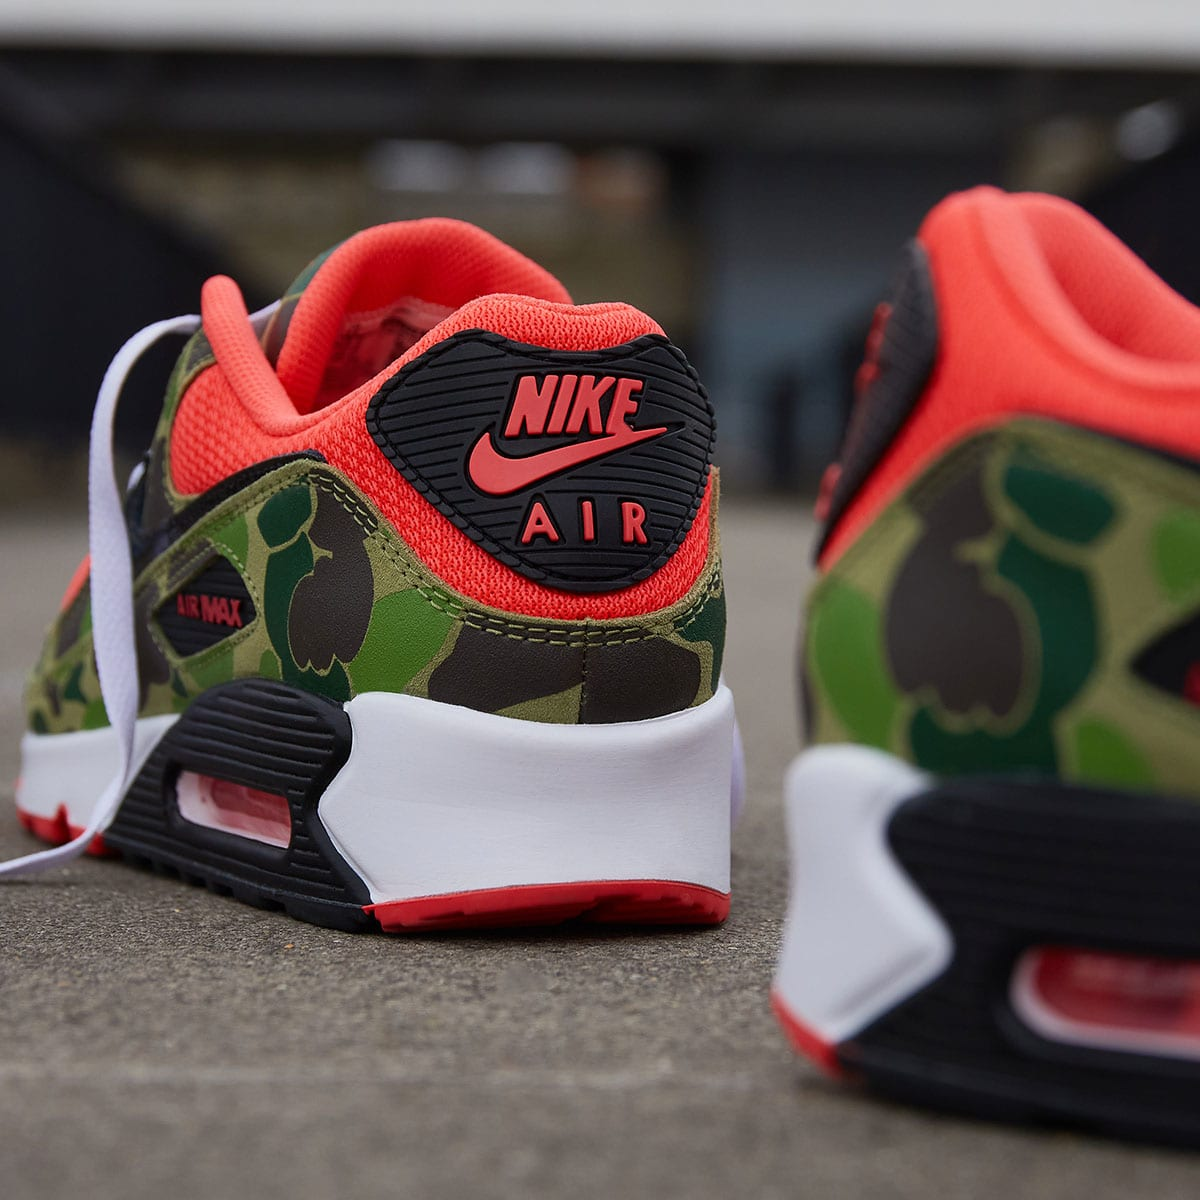 Conceder cuello hasta ahora  Buy Cheap Nike Air Max 90 Volt Running Shoes Fake Sale 2020